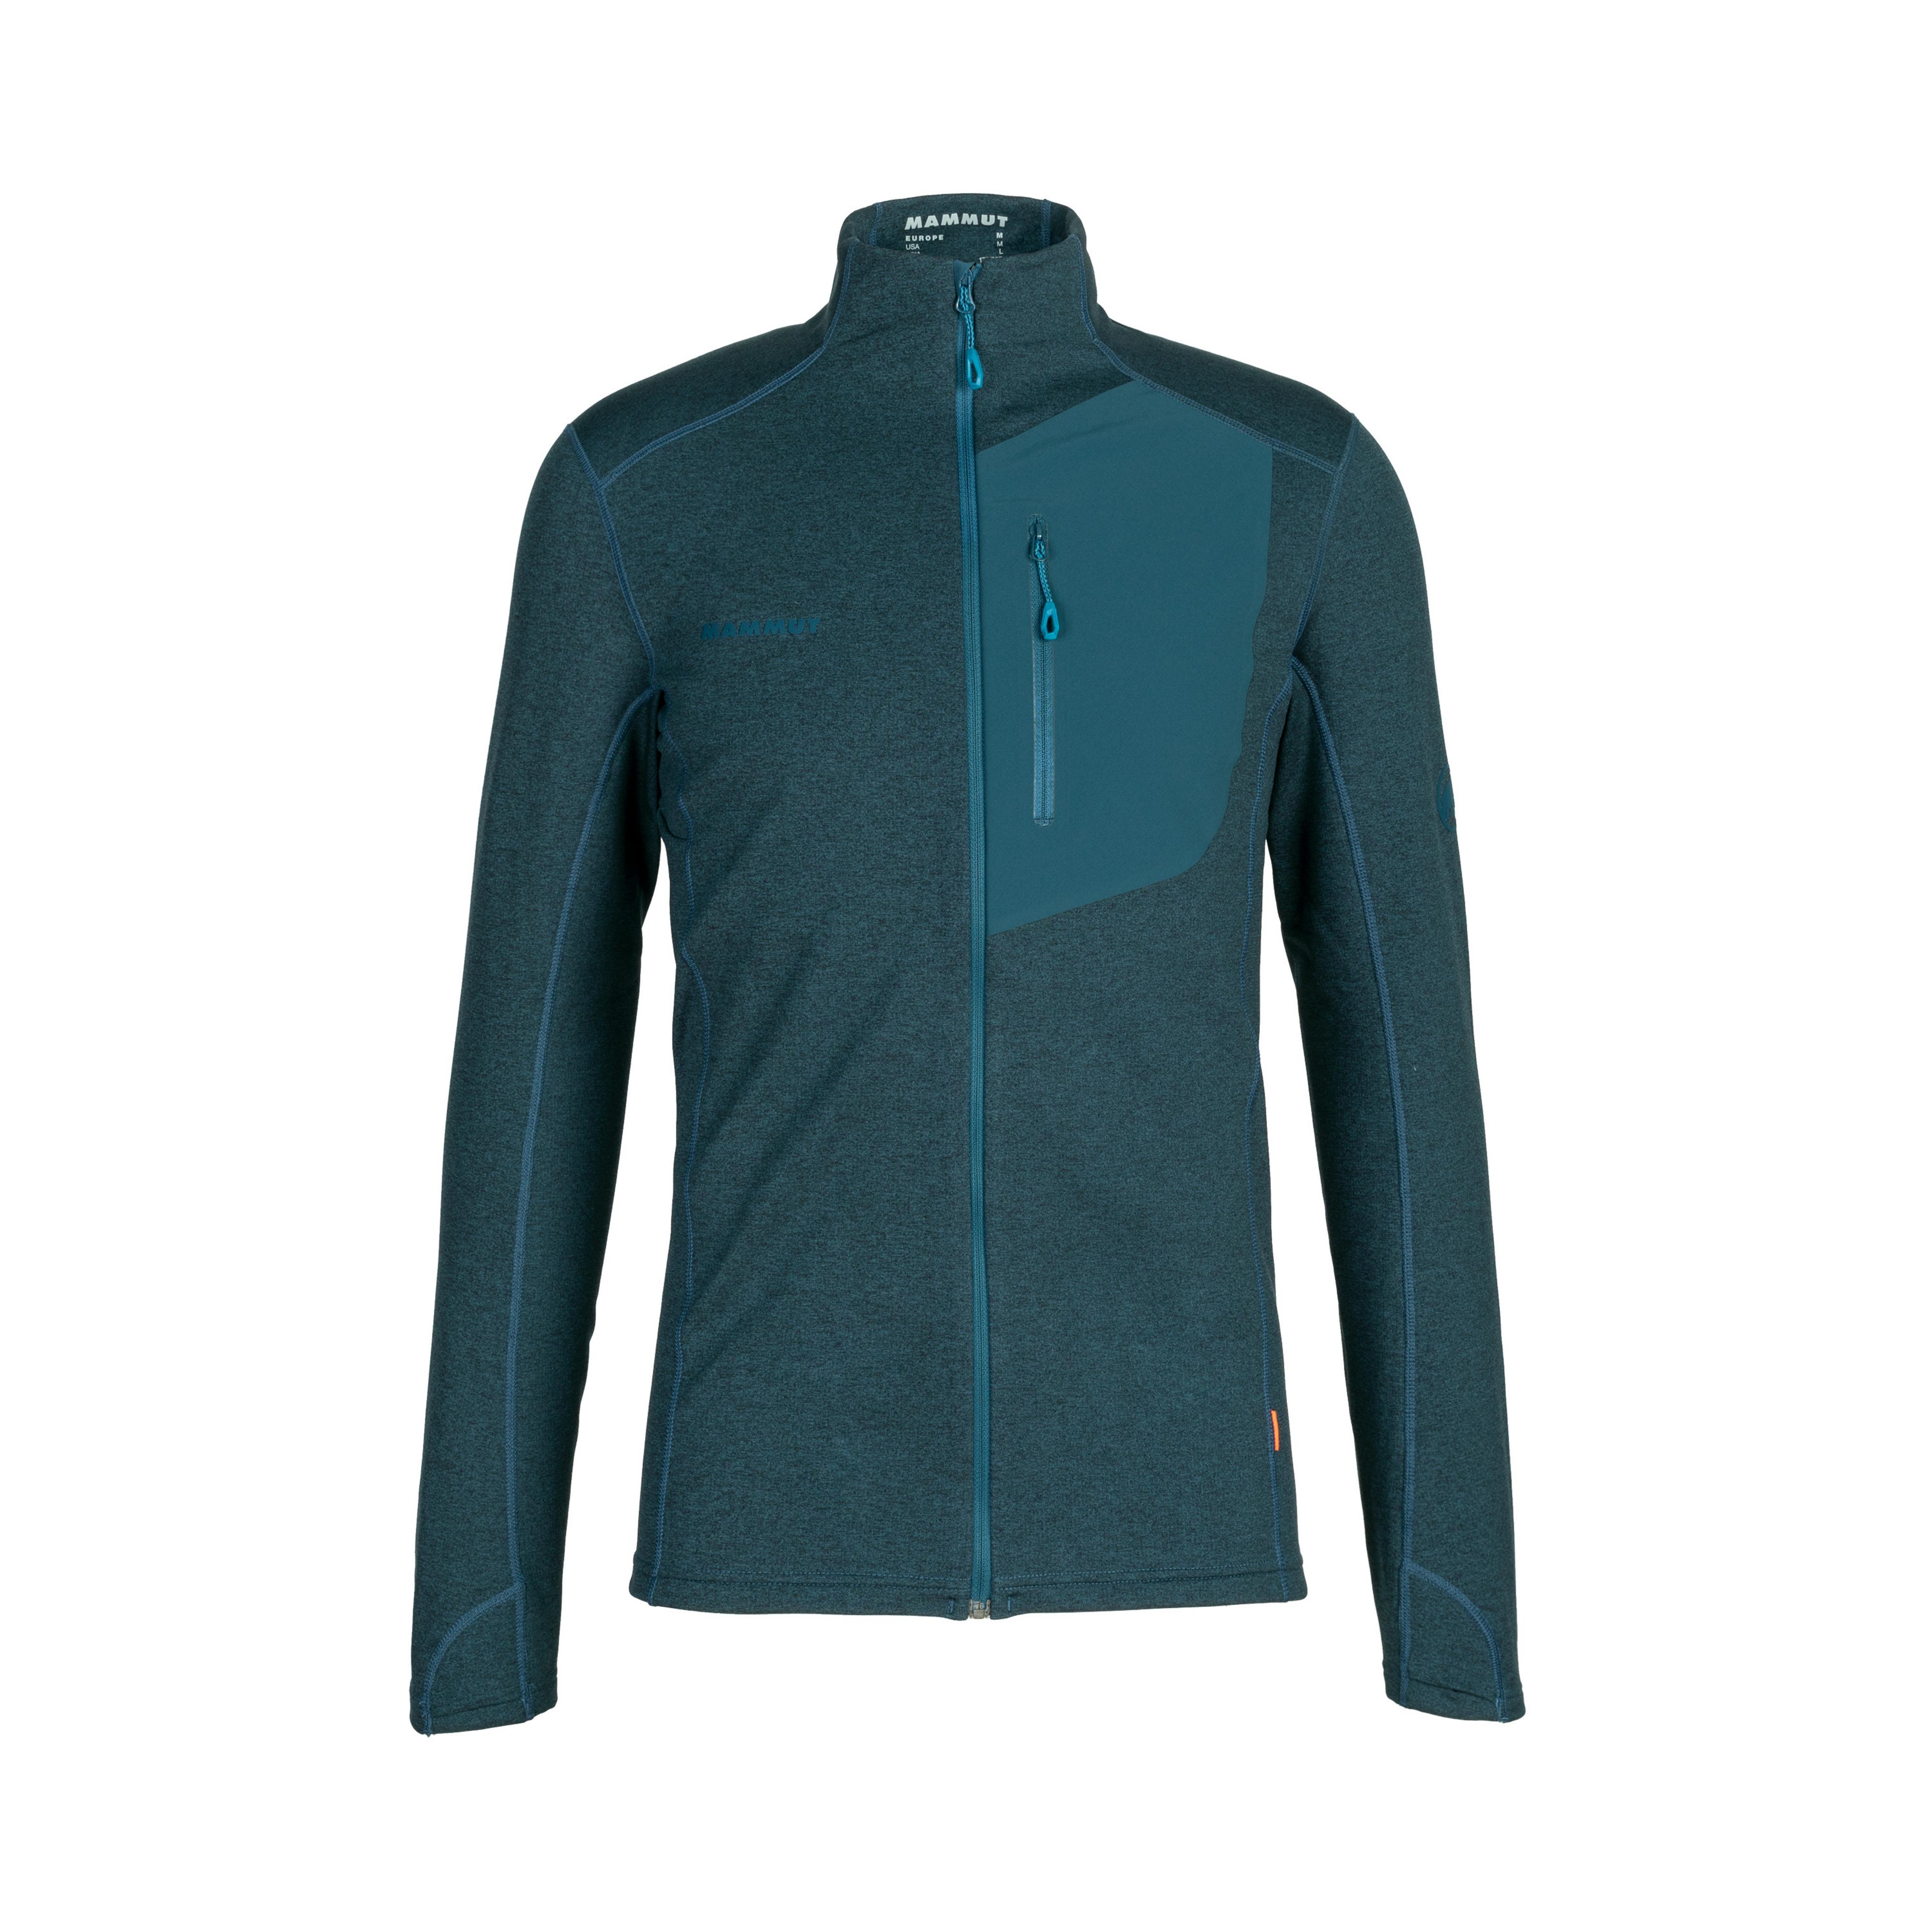 Aconcagua Light ML Jacket Men - S, wing teal thumbnail